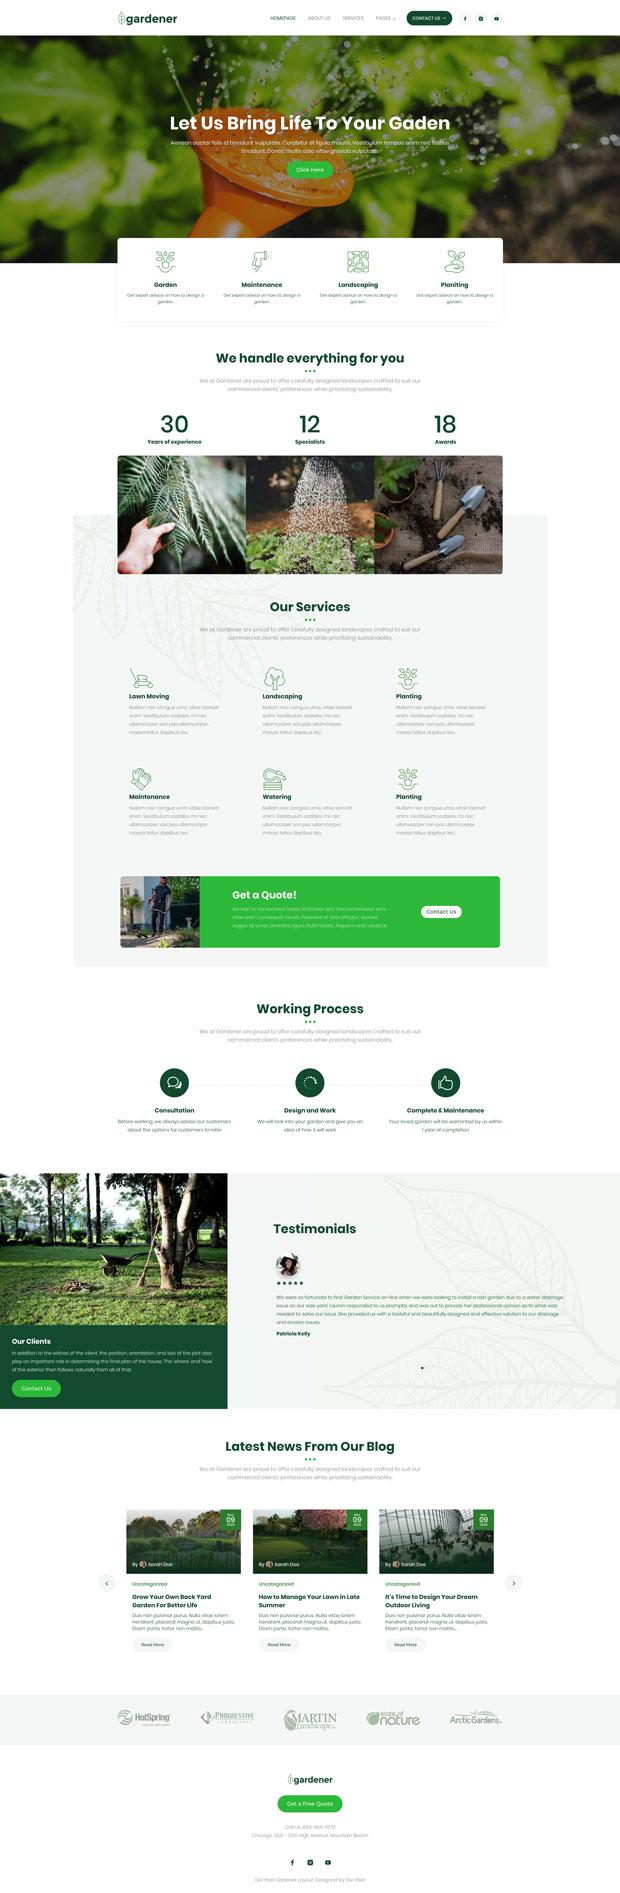 Gardener Homepage